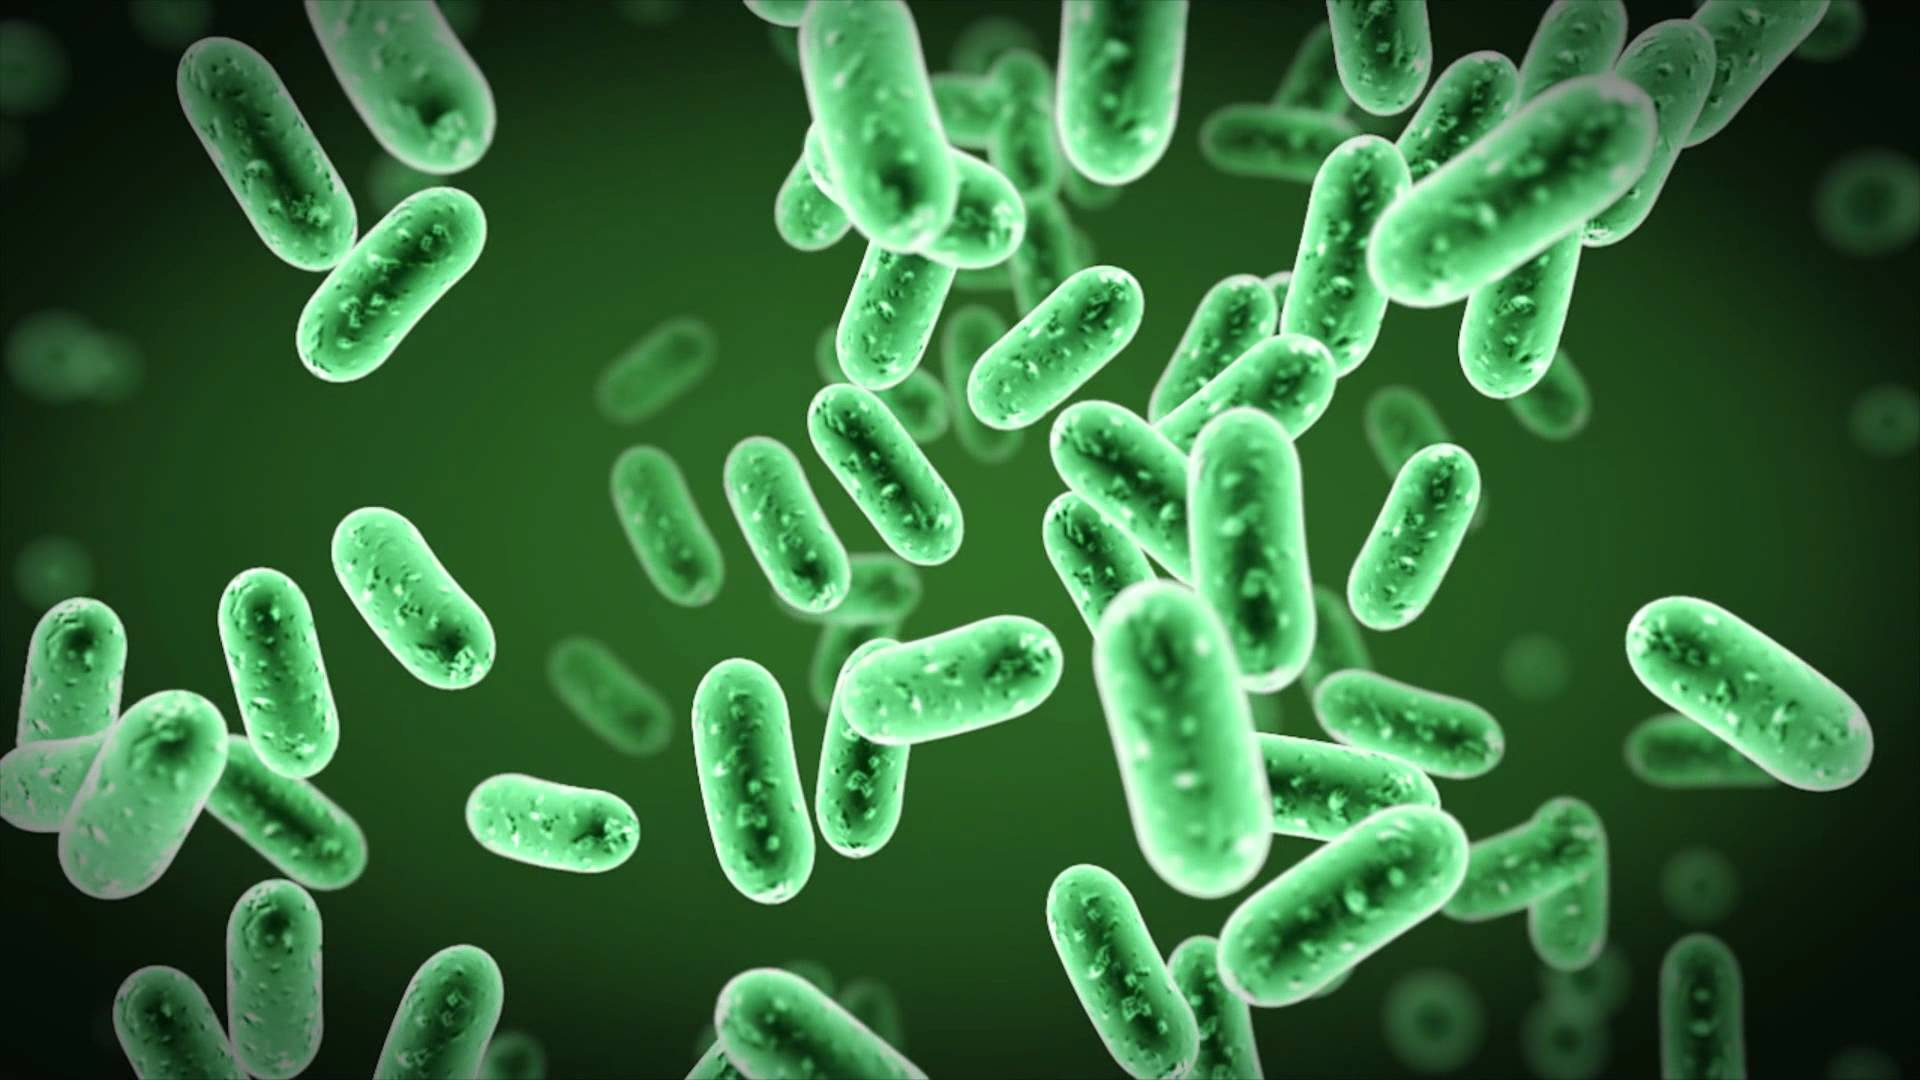 Light Nanoparticles Kill Antibiotic Resistant Bacteria